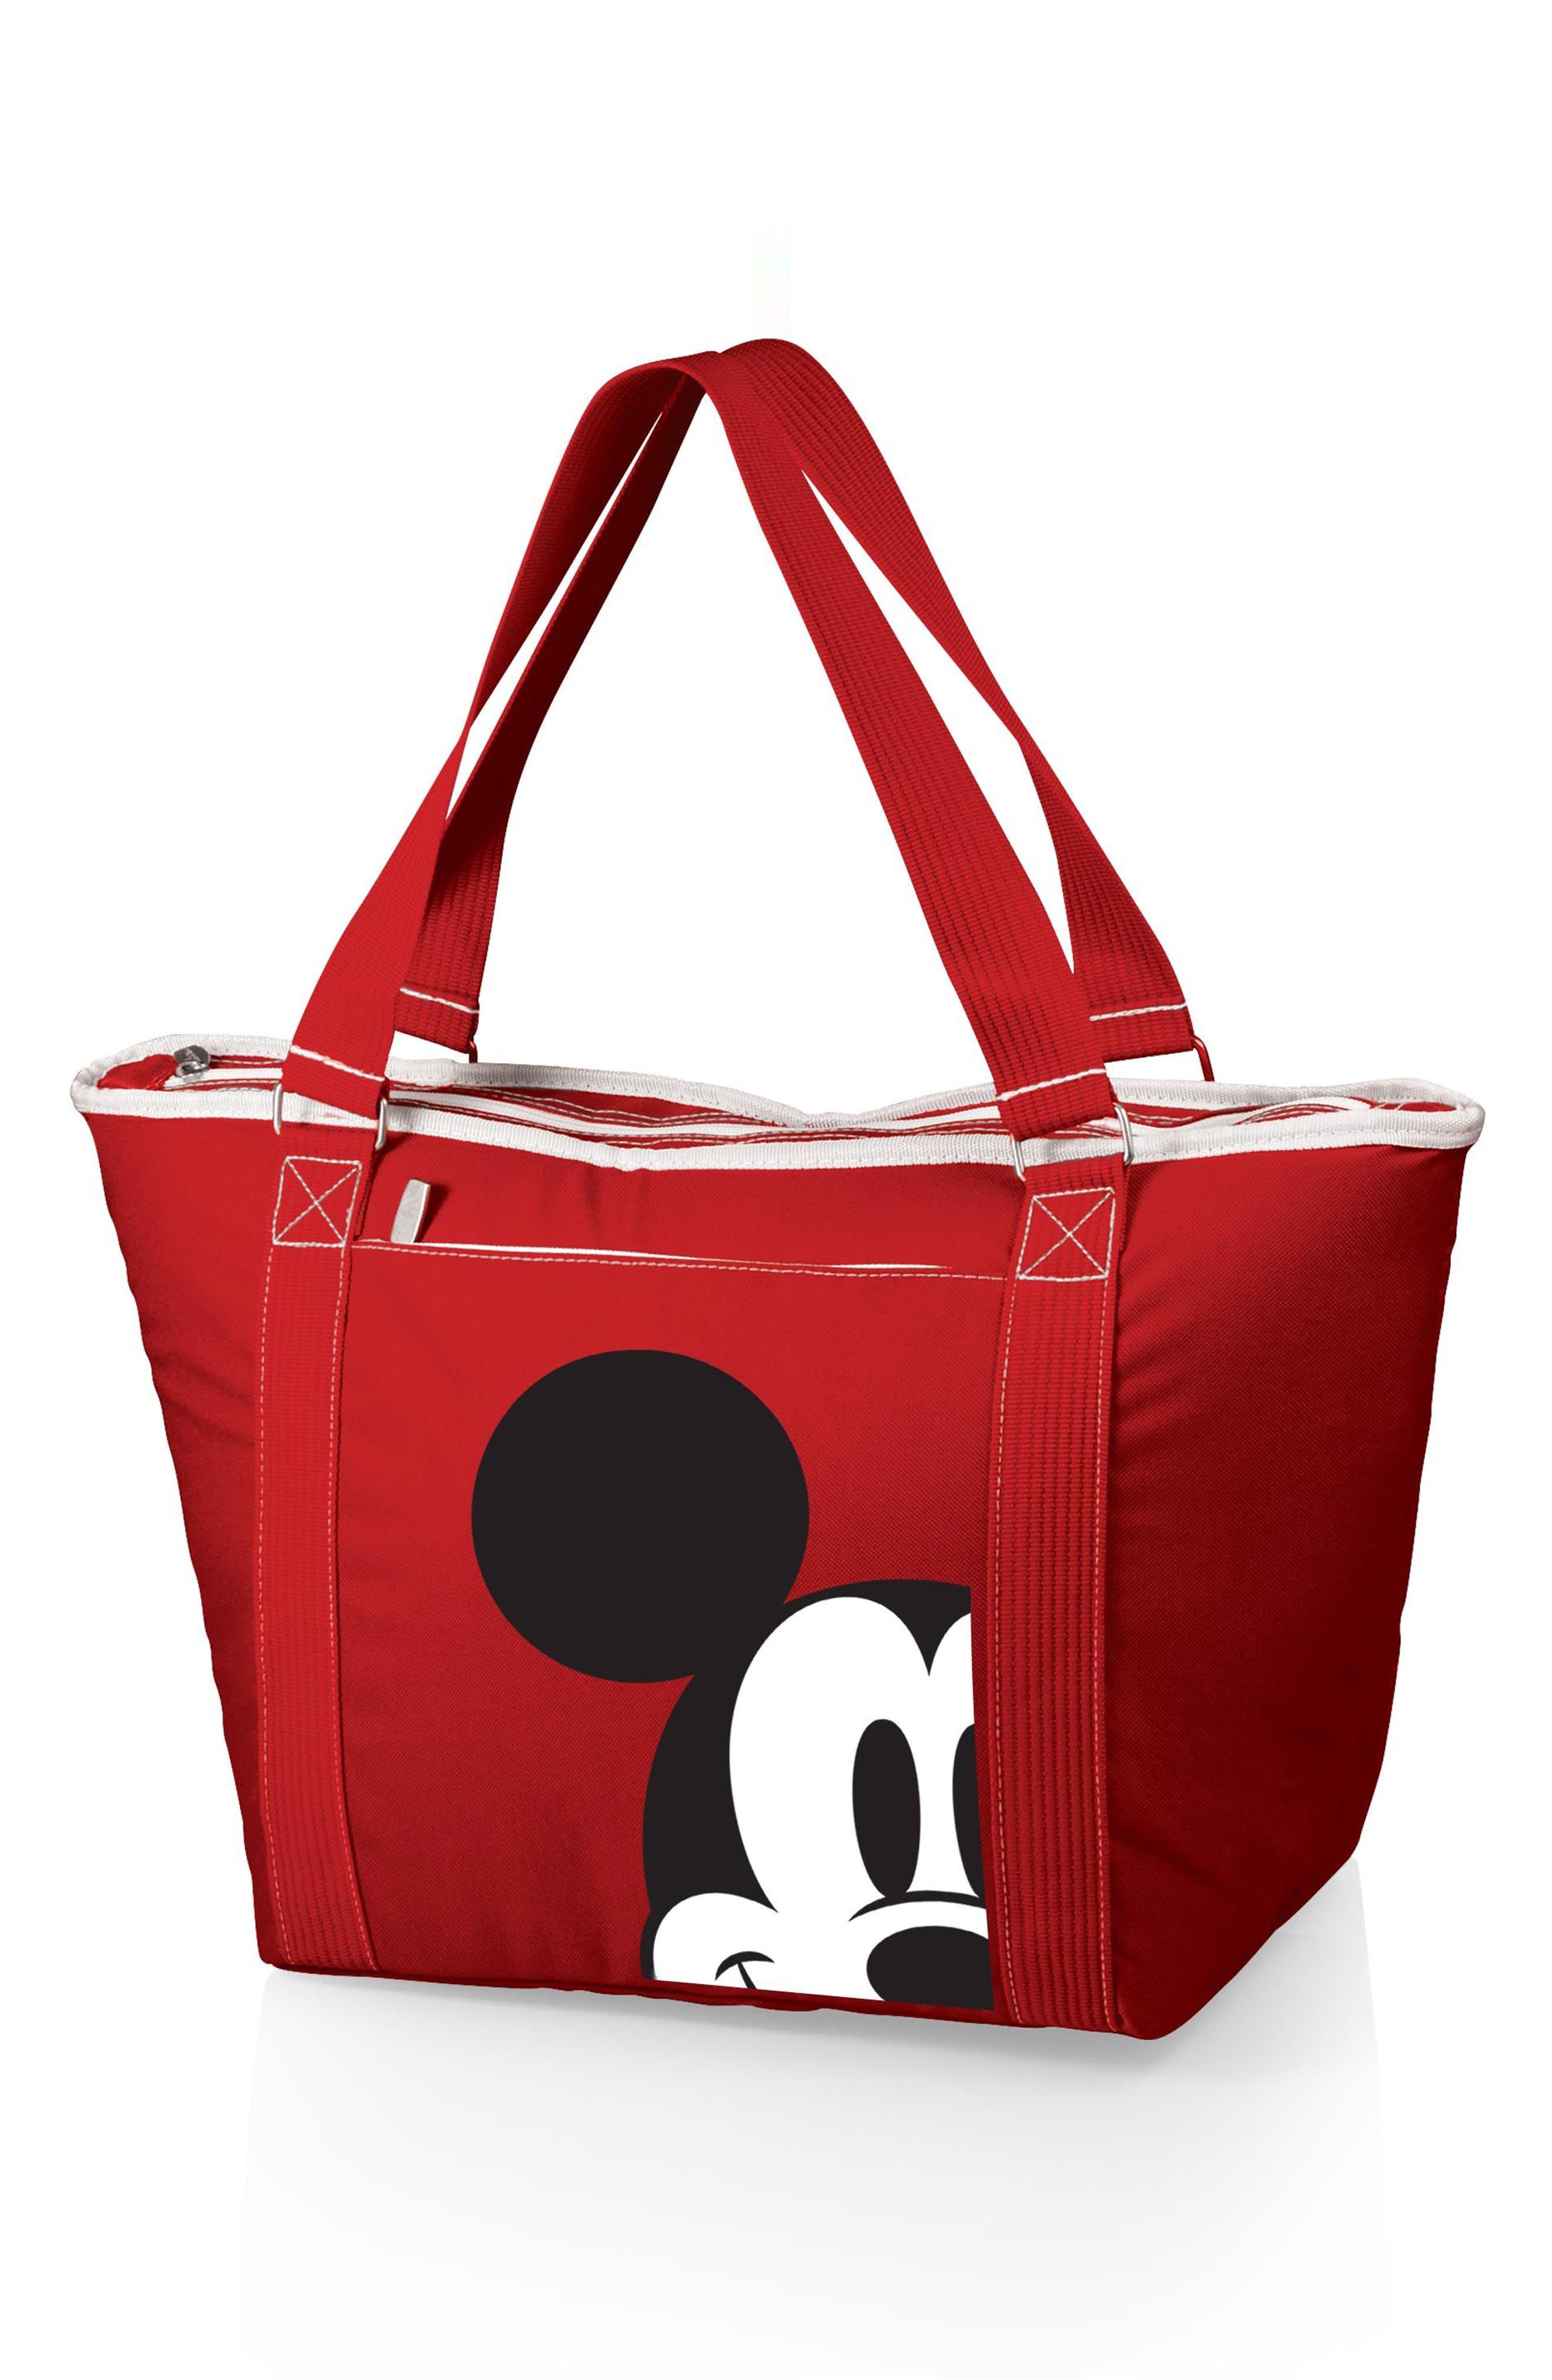 Disney<sup>®</sup> Mickey Mouse Topanga Cooler Tote,                         Main,                         color, Mickey